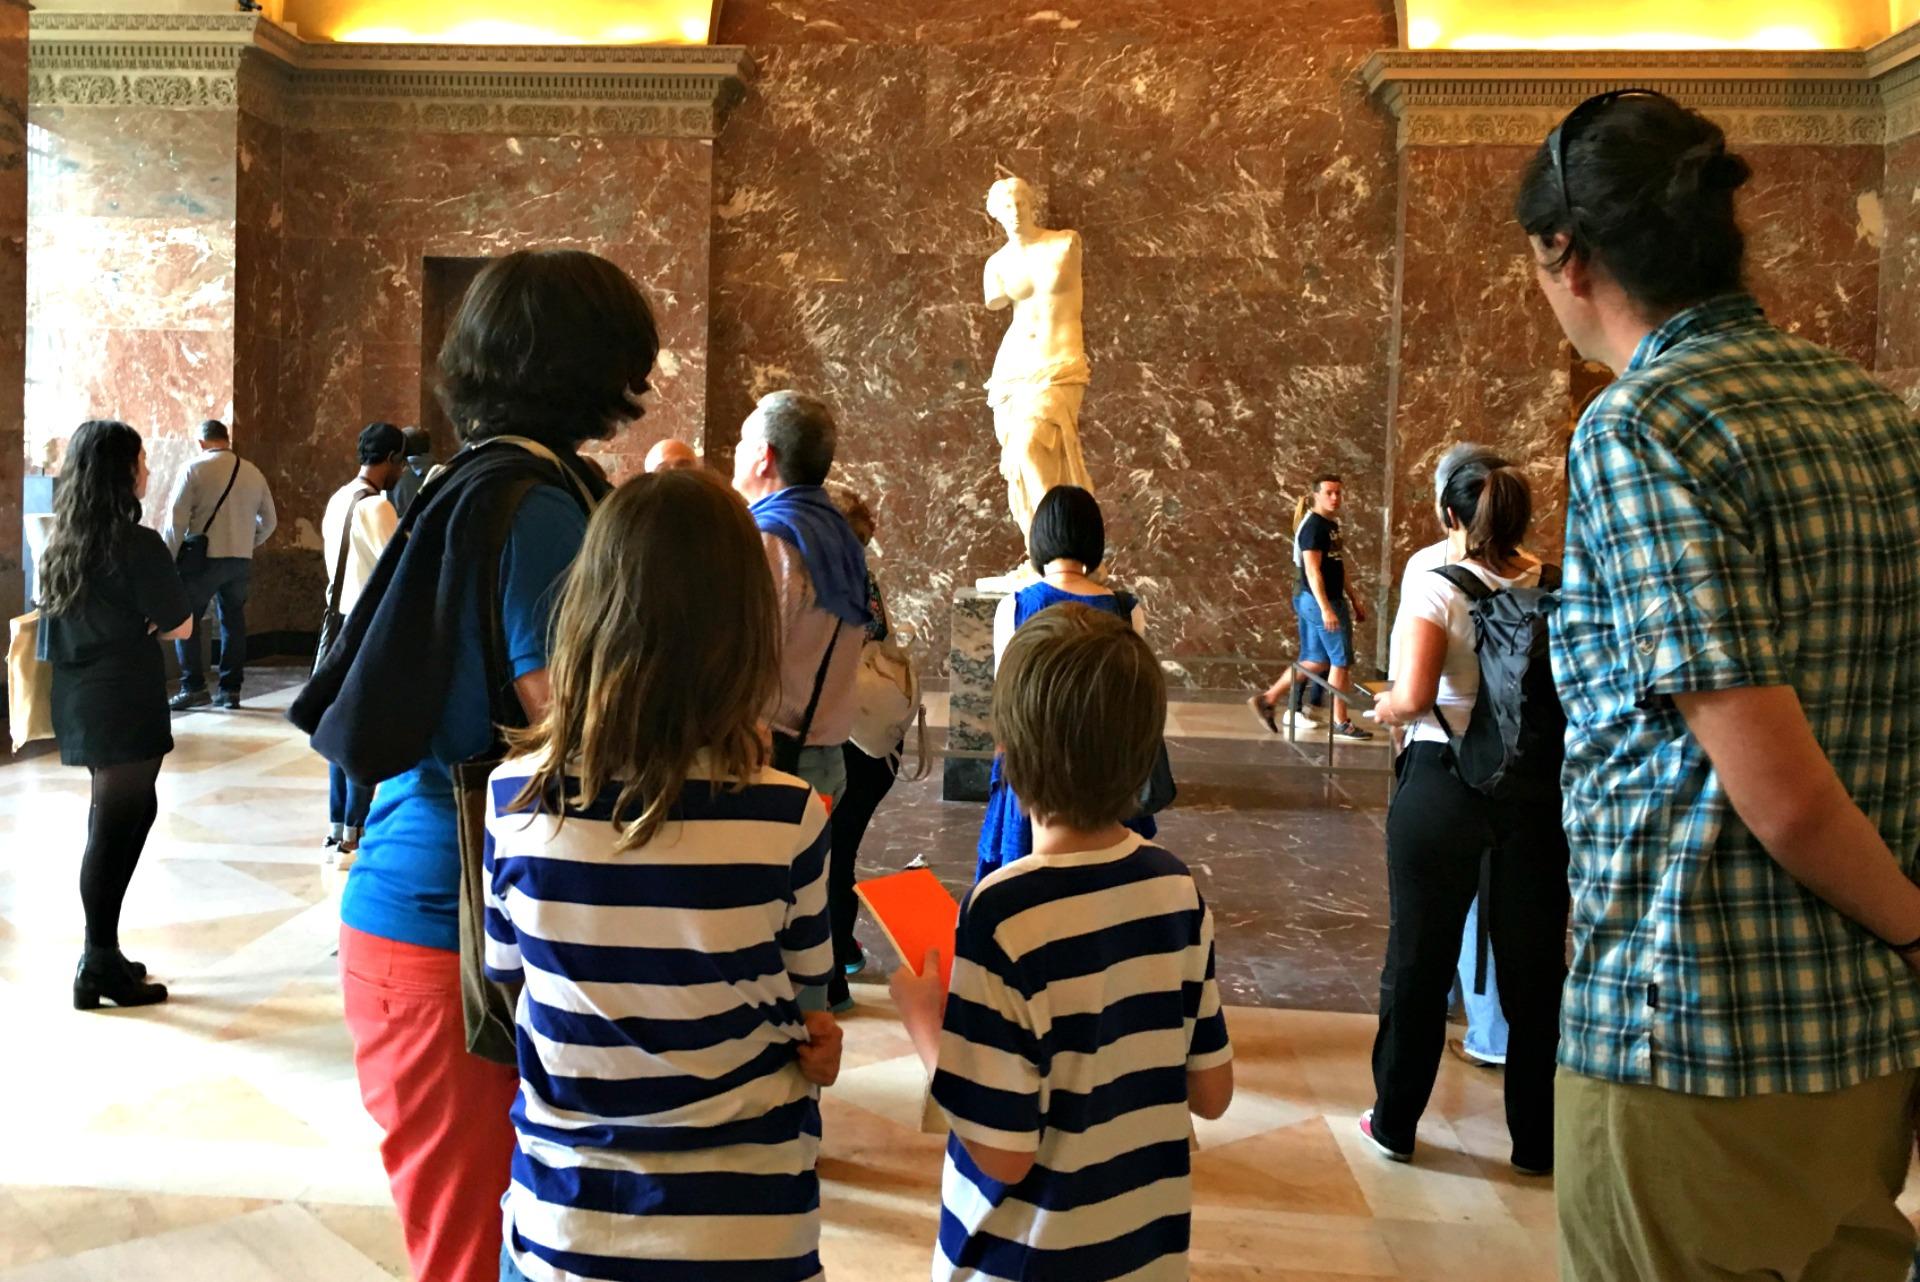 Private tour of the Louvre Paris